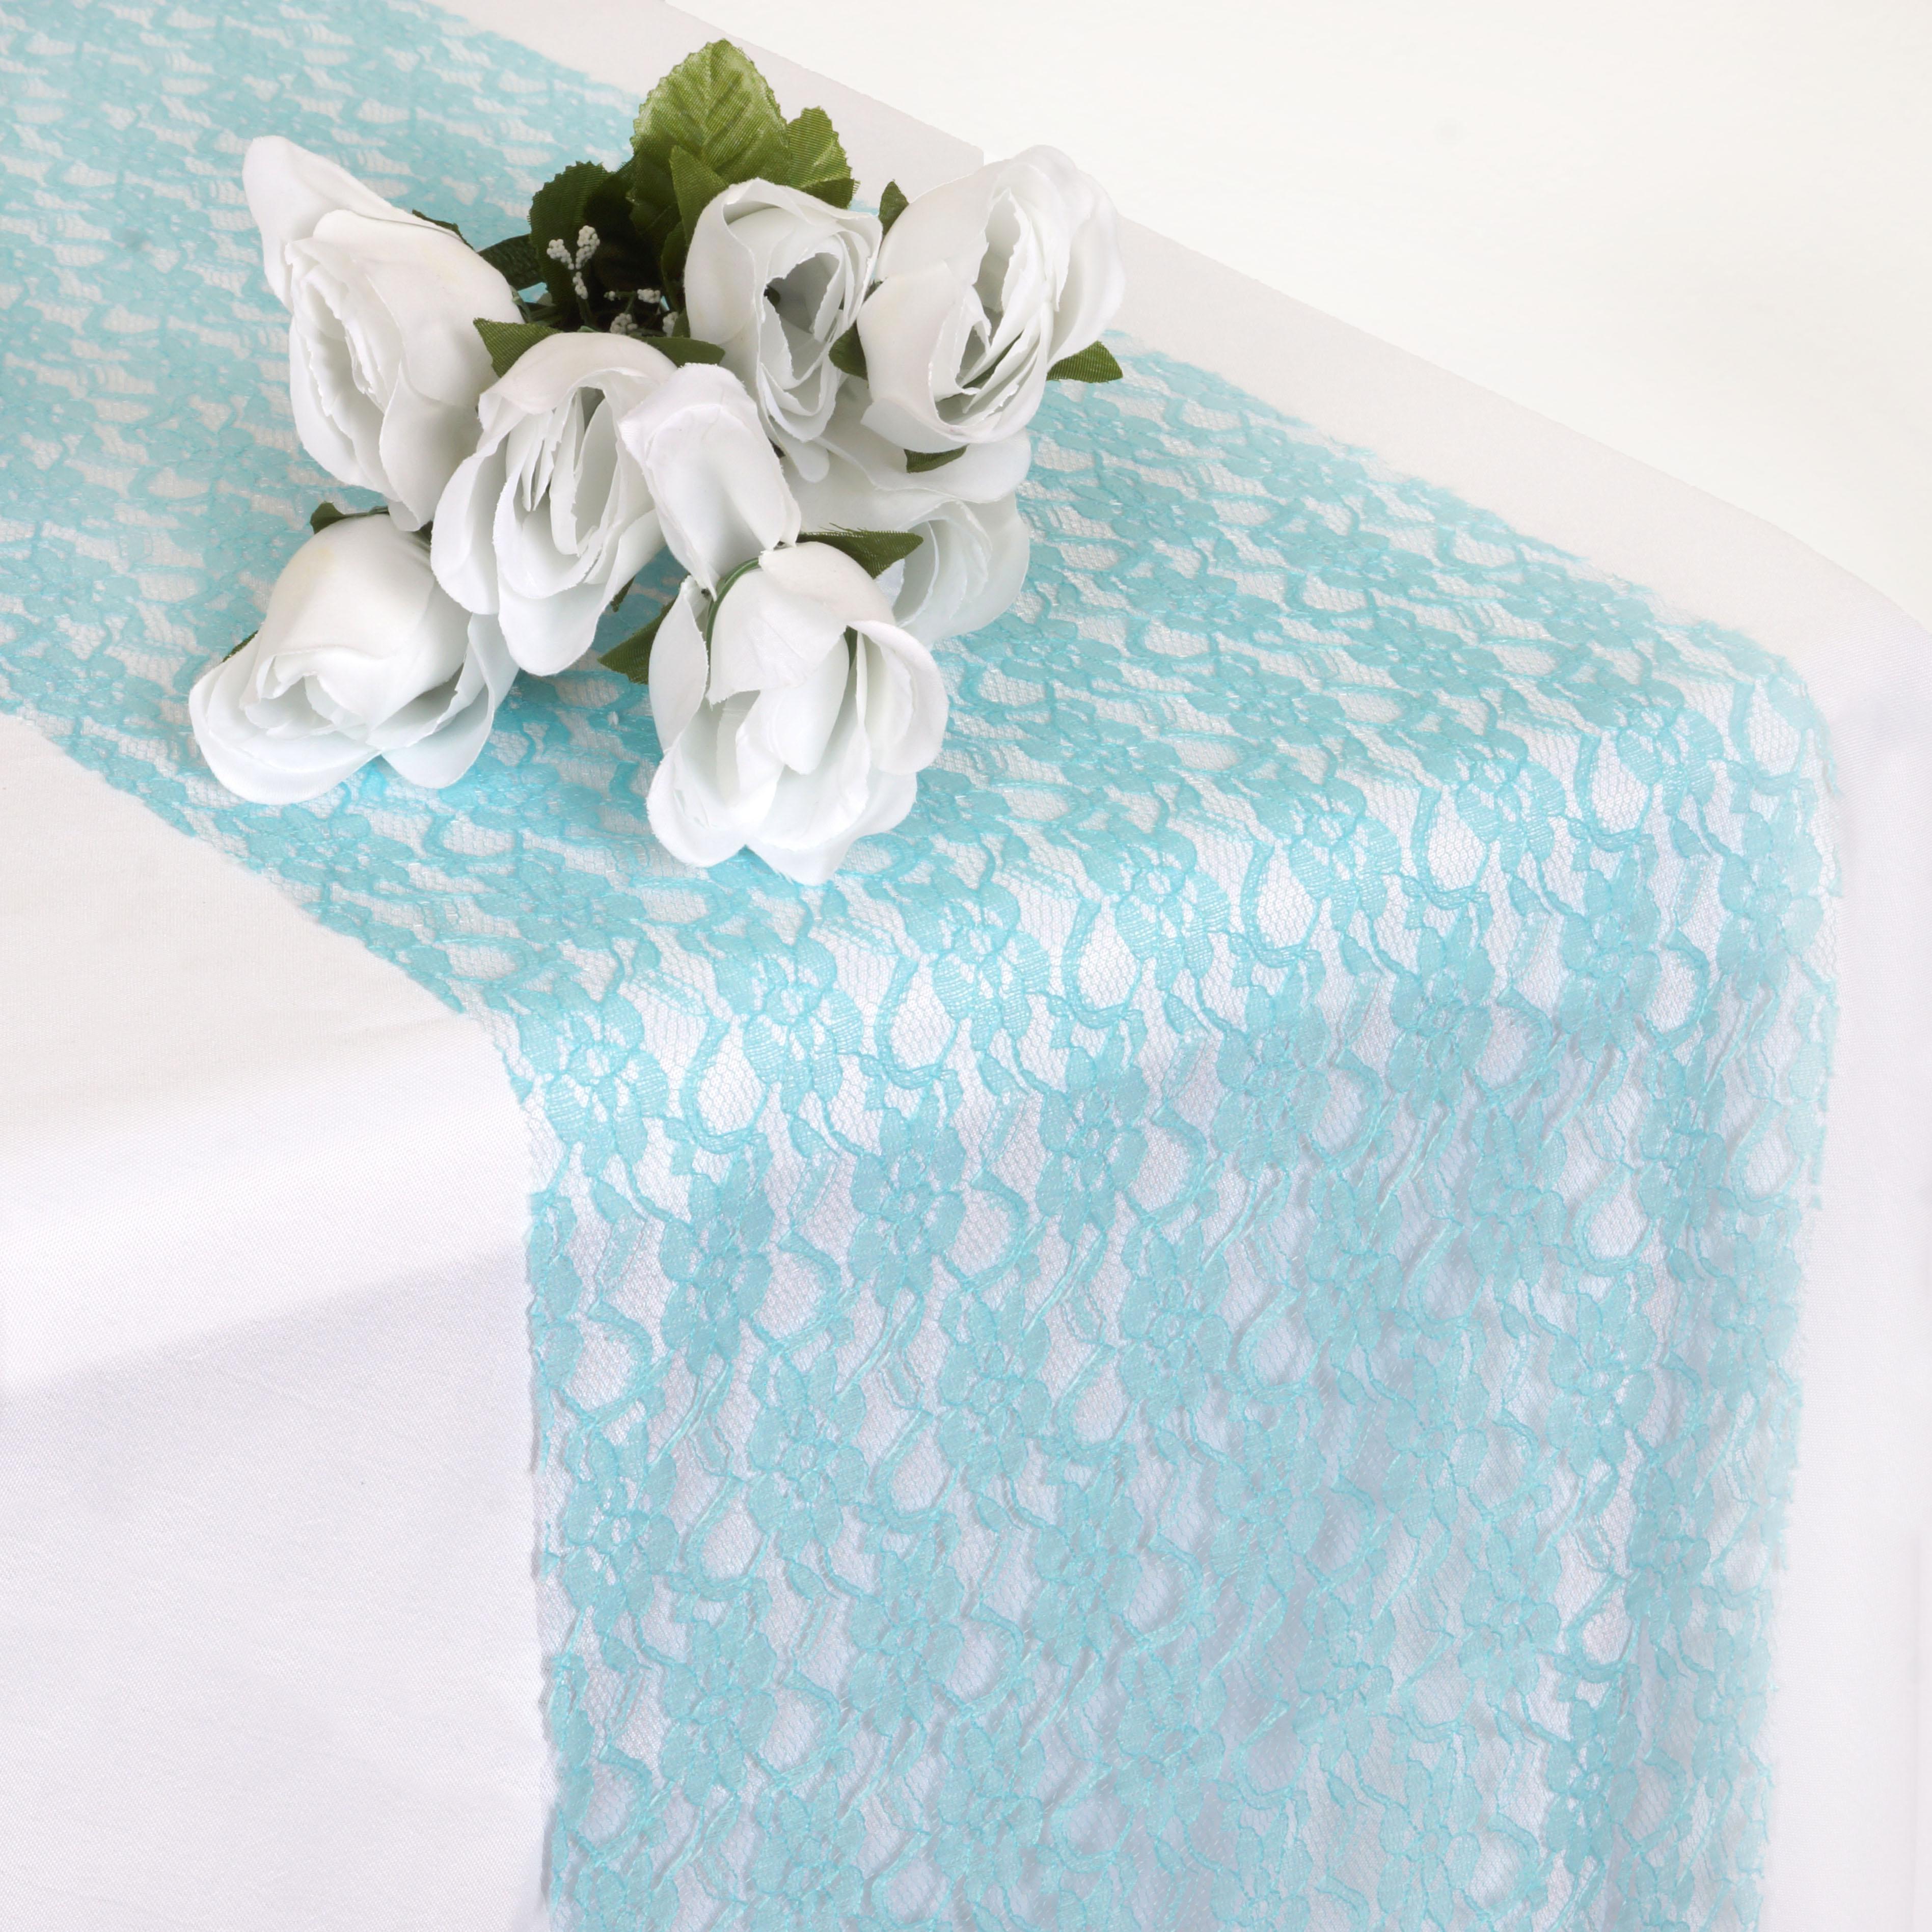 12 034 X 108 034 Floral Pattern Lace